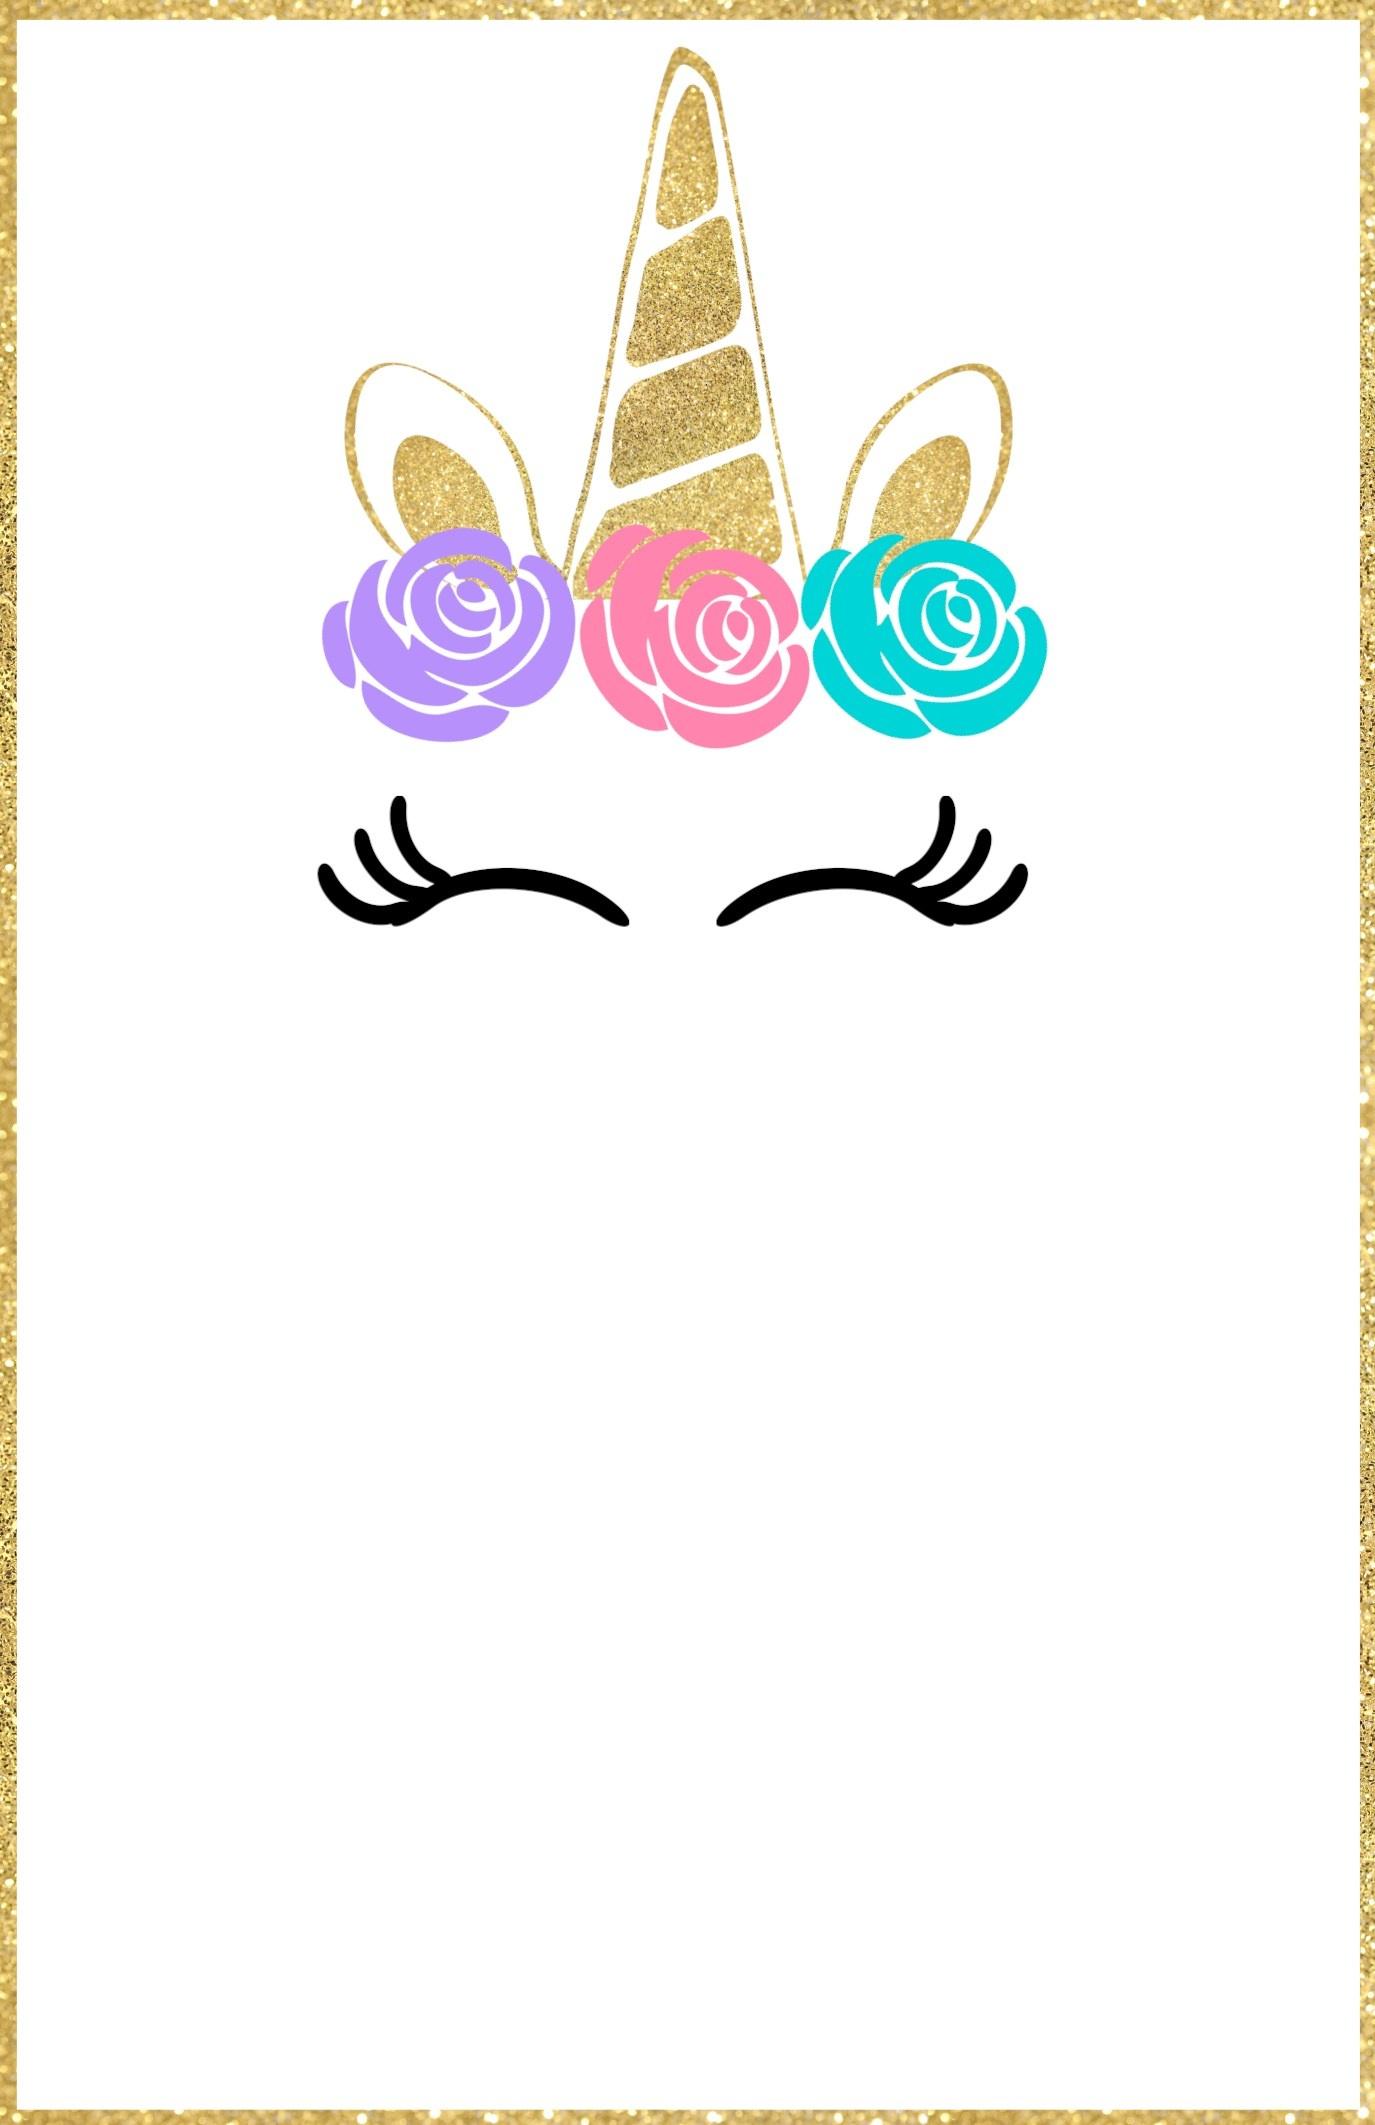 Free Printable Unicorn Invitations Template - Paper Trail Design - Free Unicorn Birthday Printables